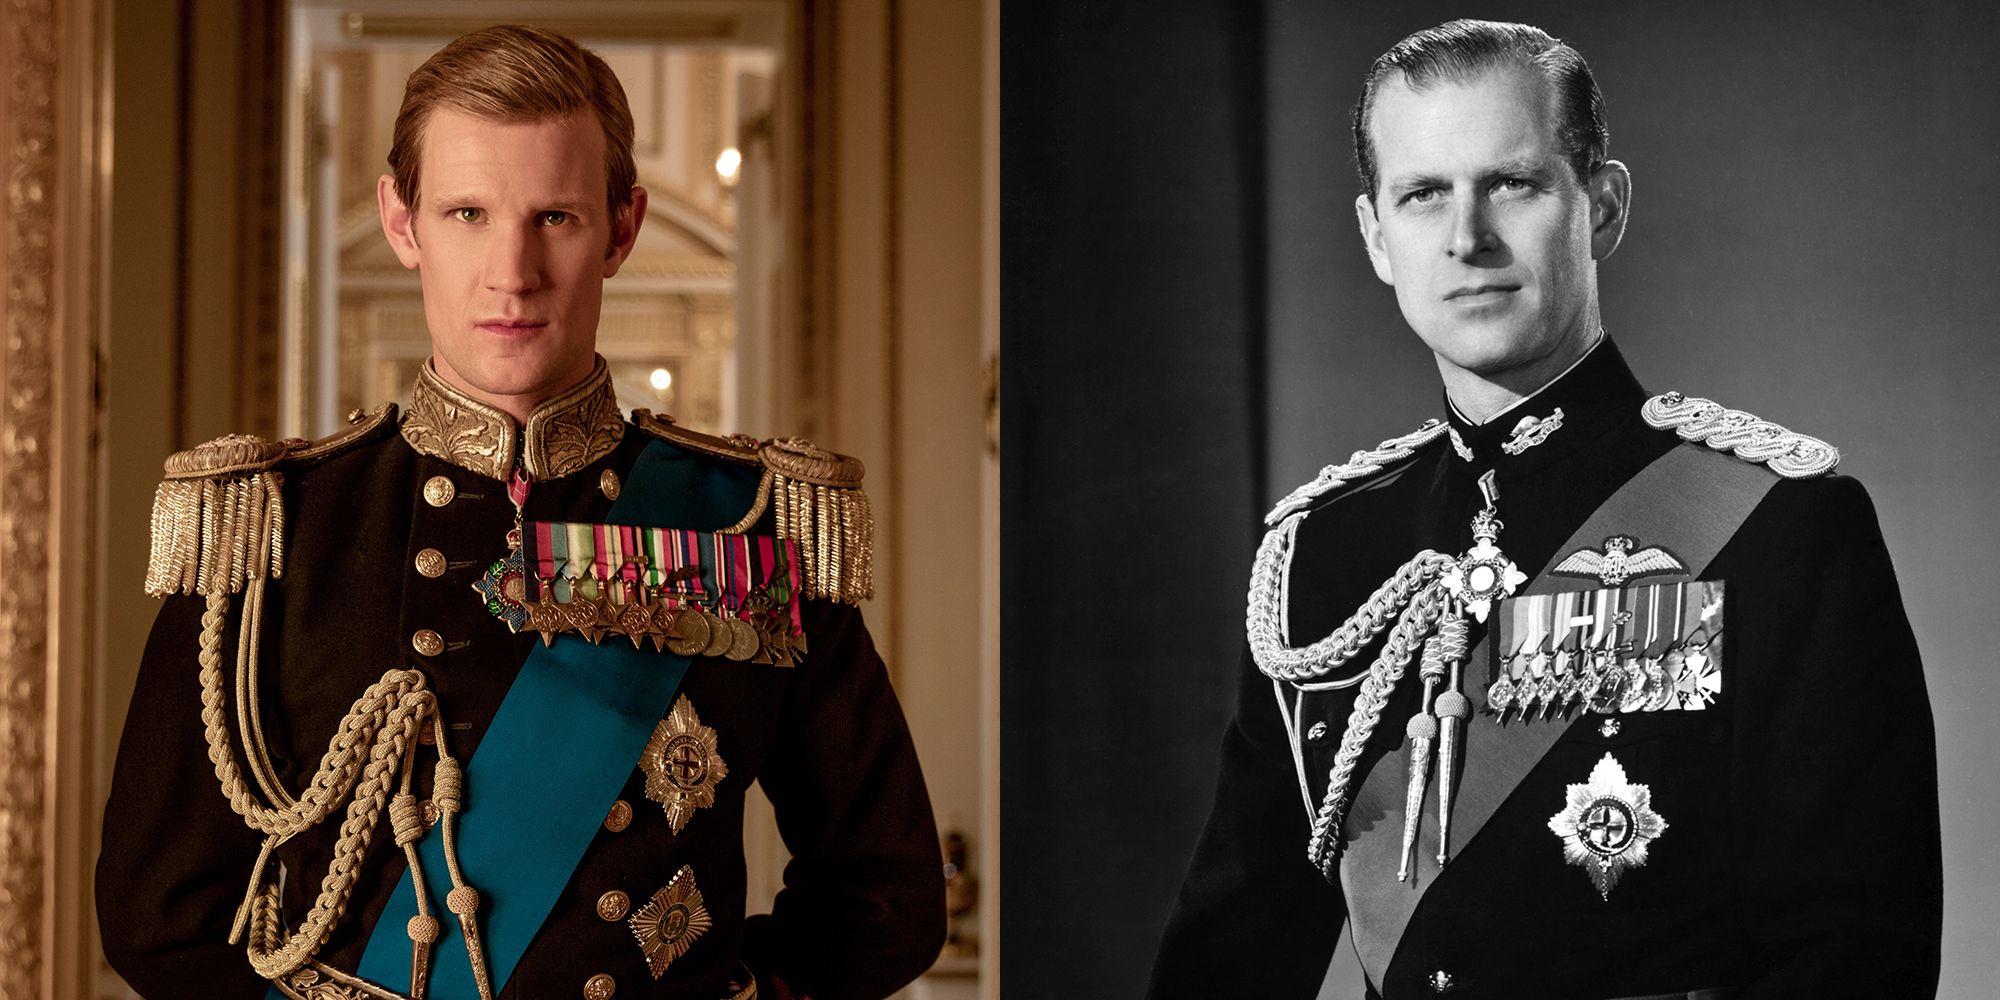 Prince Philip, the Duke of Edinburgh (seasons one and two)